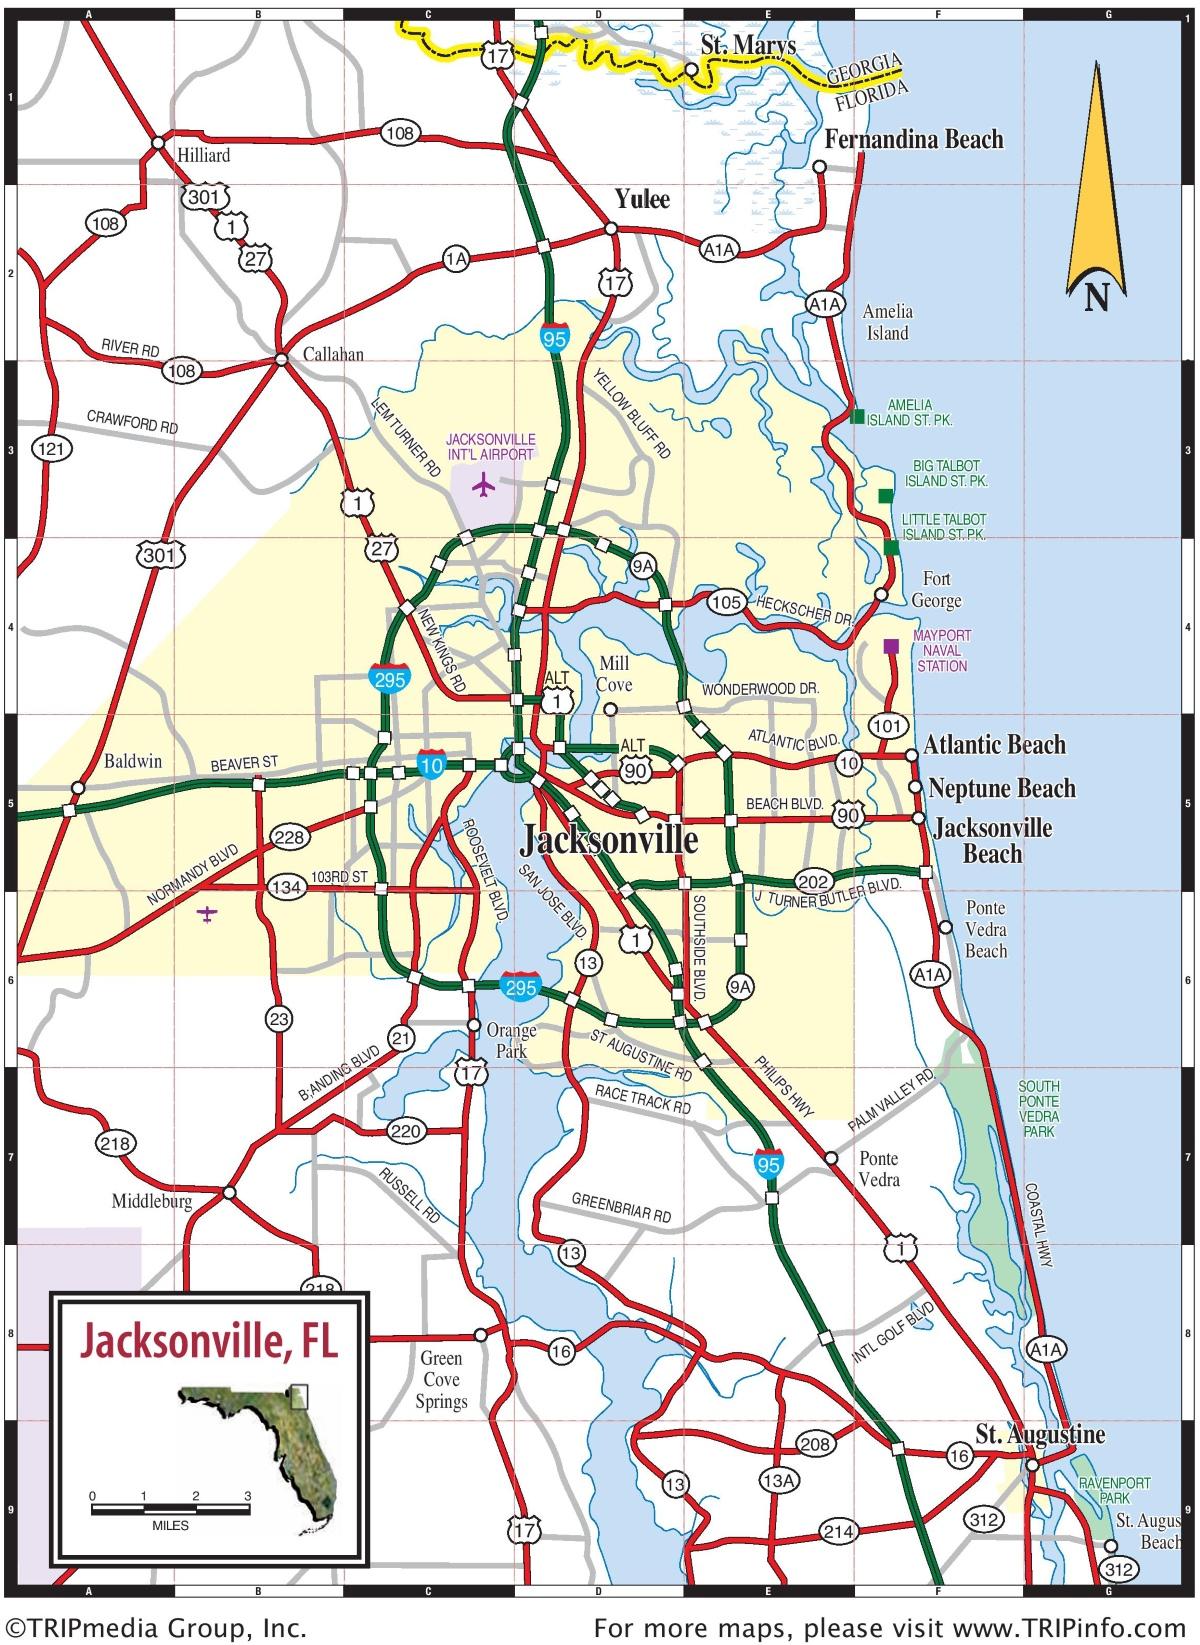 Jacksonville area road map